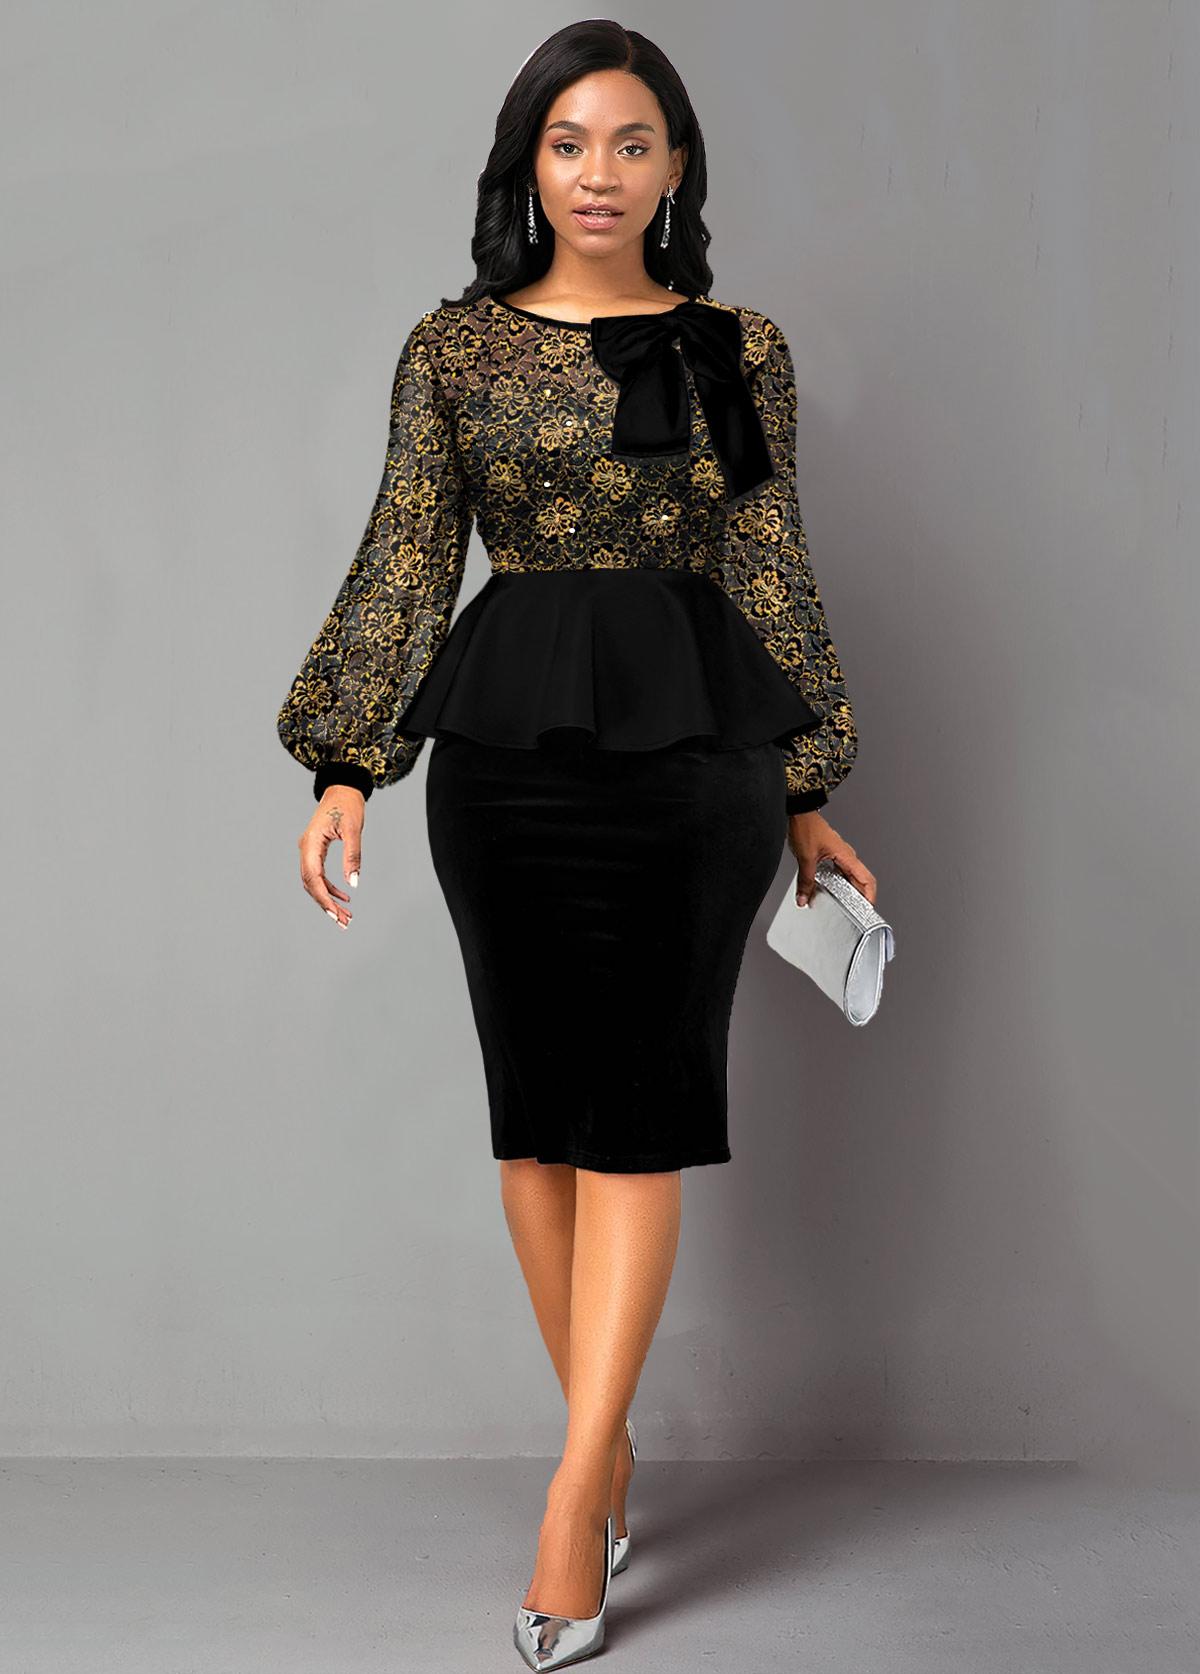 ROTITA Sequin Lace Panel Peplum Waist Bowknot Dress